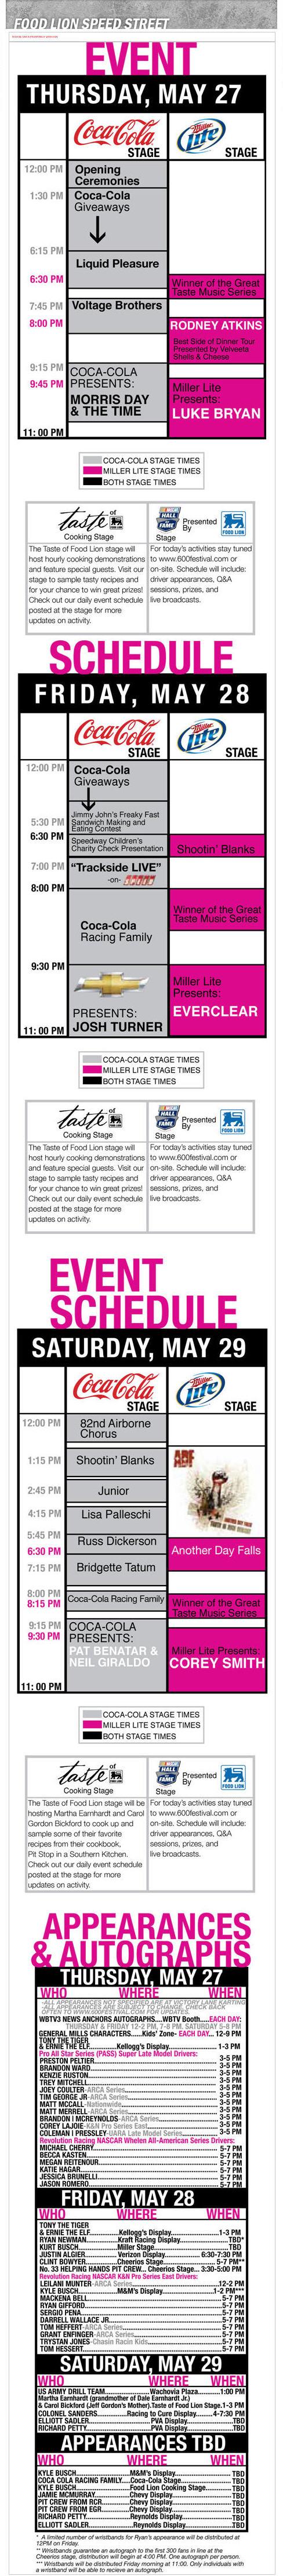 2010 Food Lion Speed Street Full Event Schedule